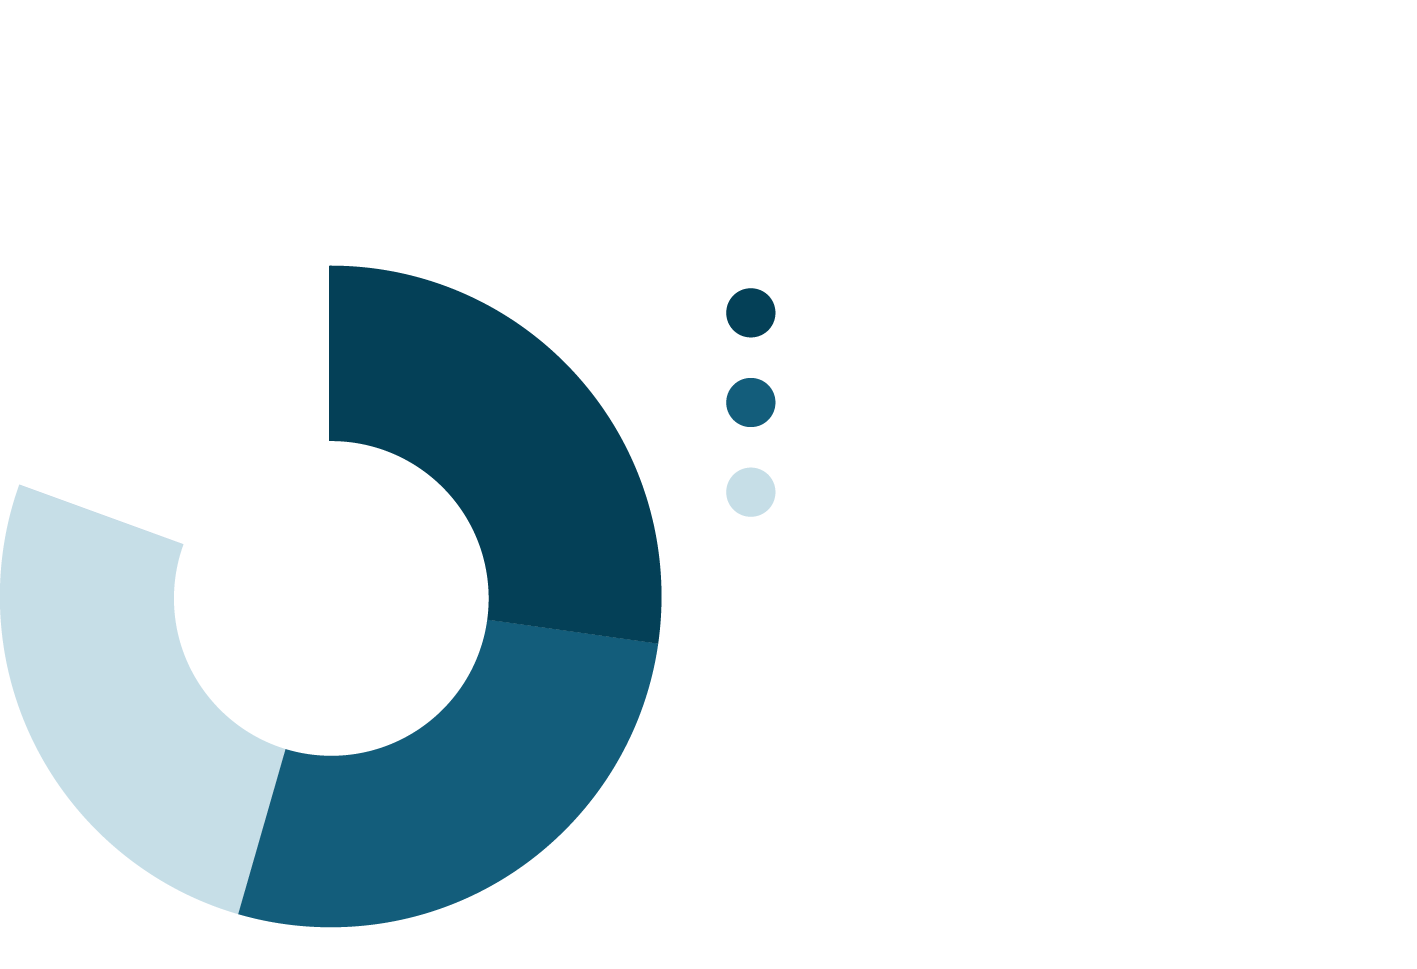 Vector_Charts_01_Allocation Breakdown.png